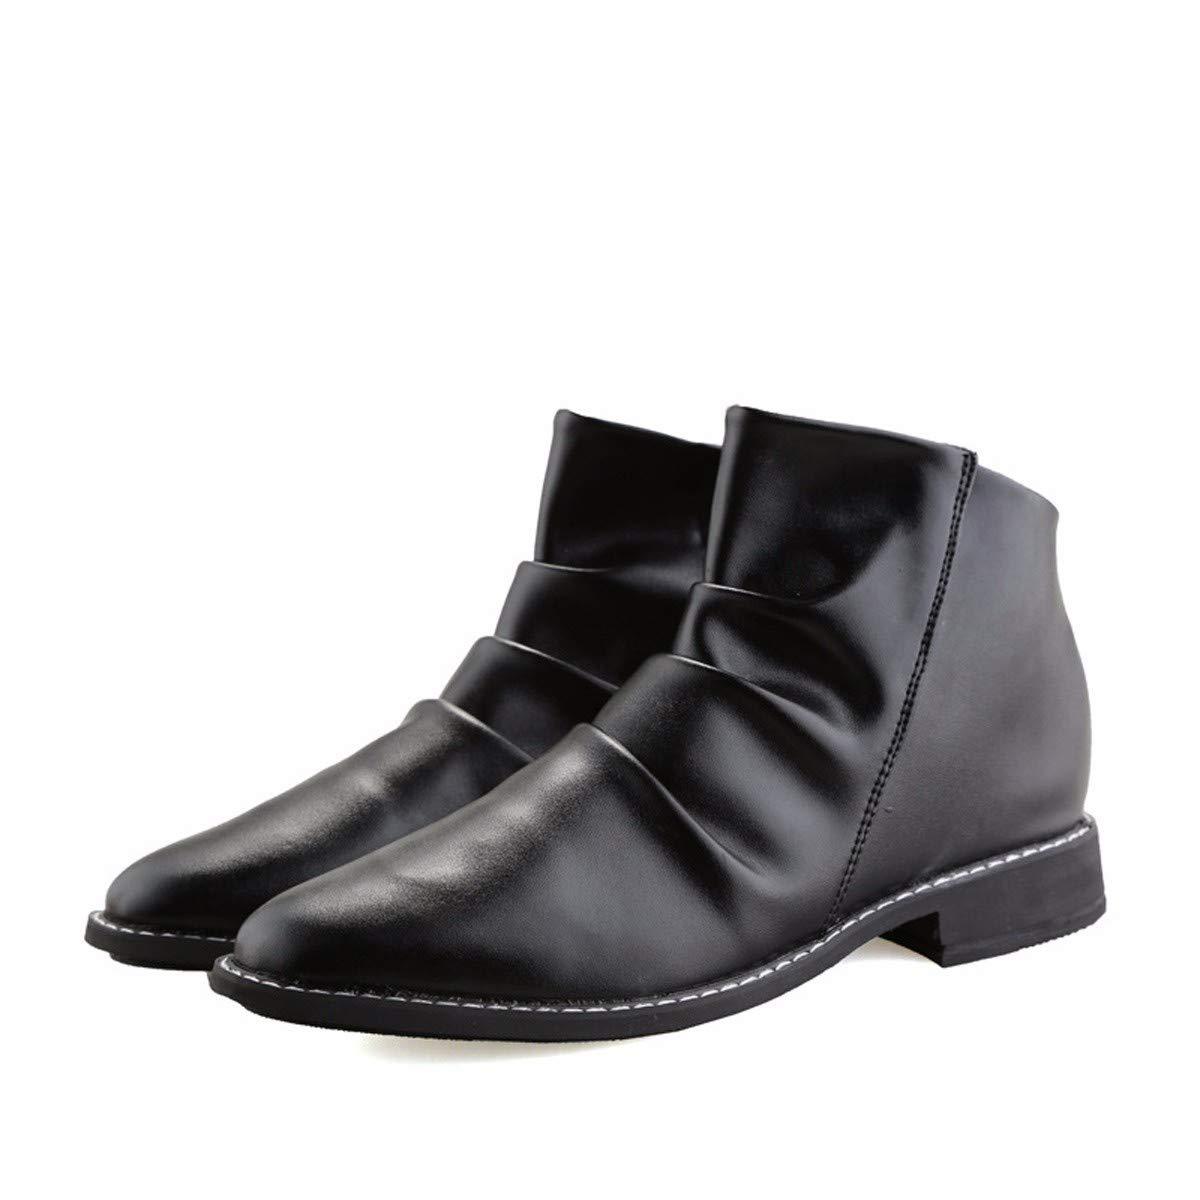 KMJBS-Mode Lässige Stiefel Britische GAO Peng Martin Lederstiefel Männer Schwarz 42